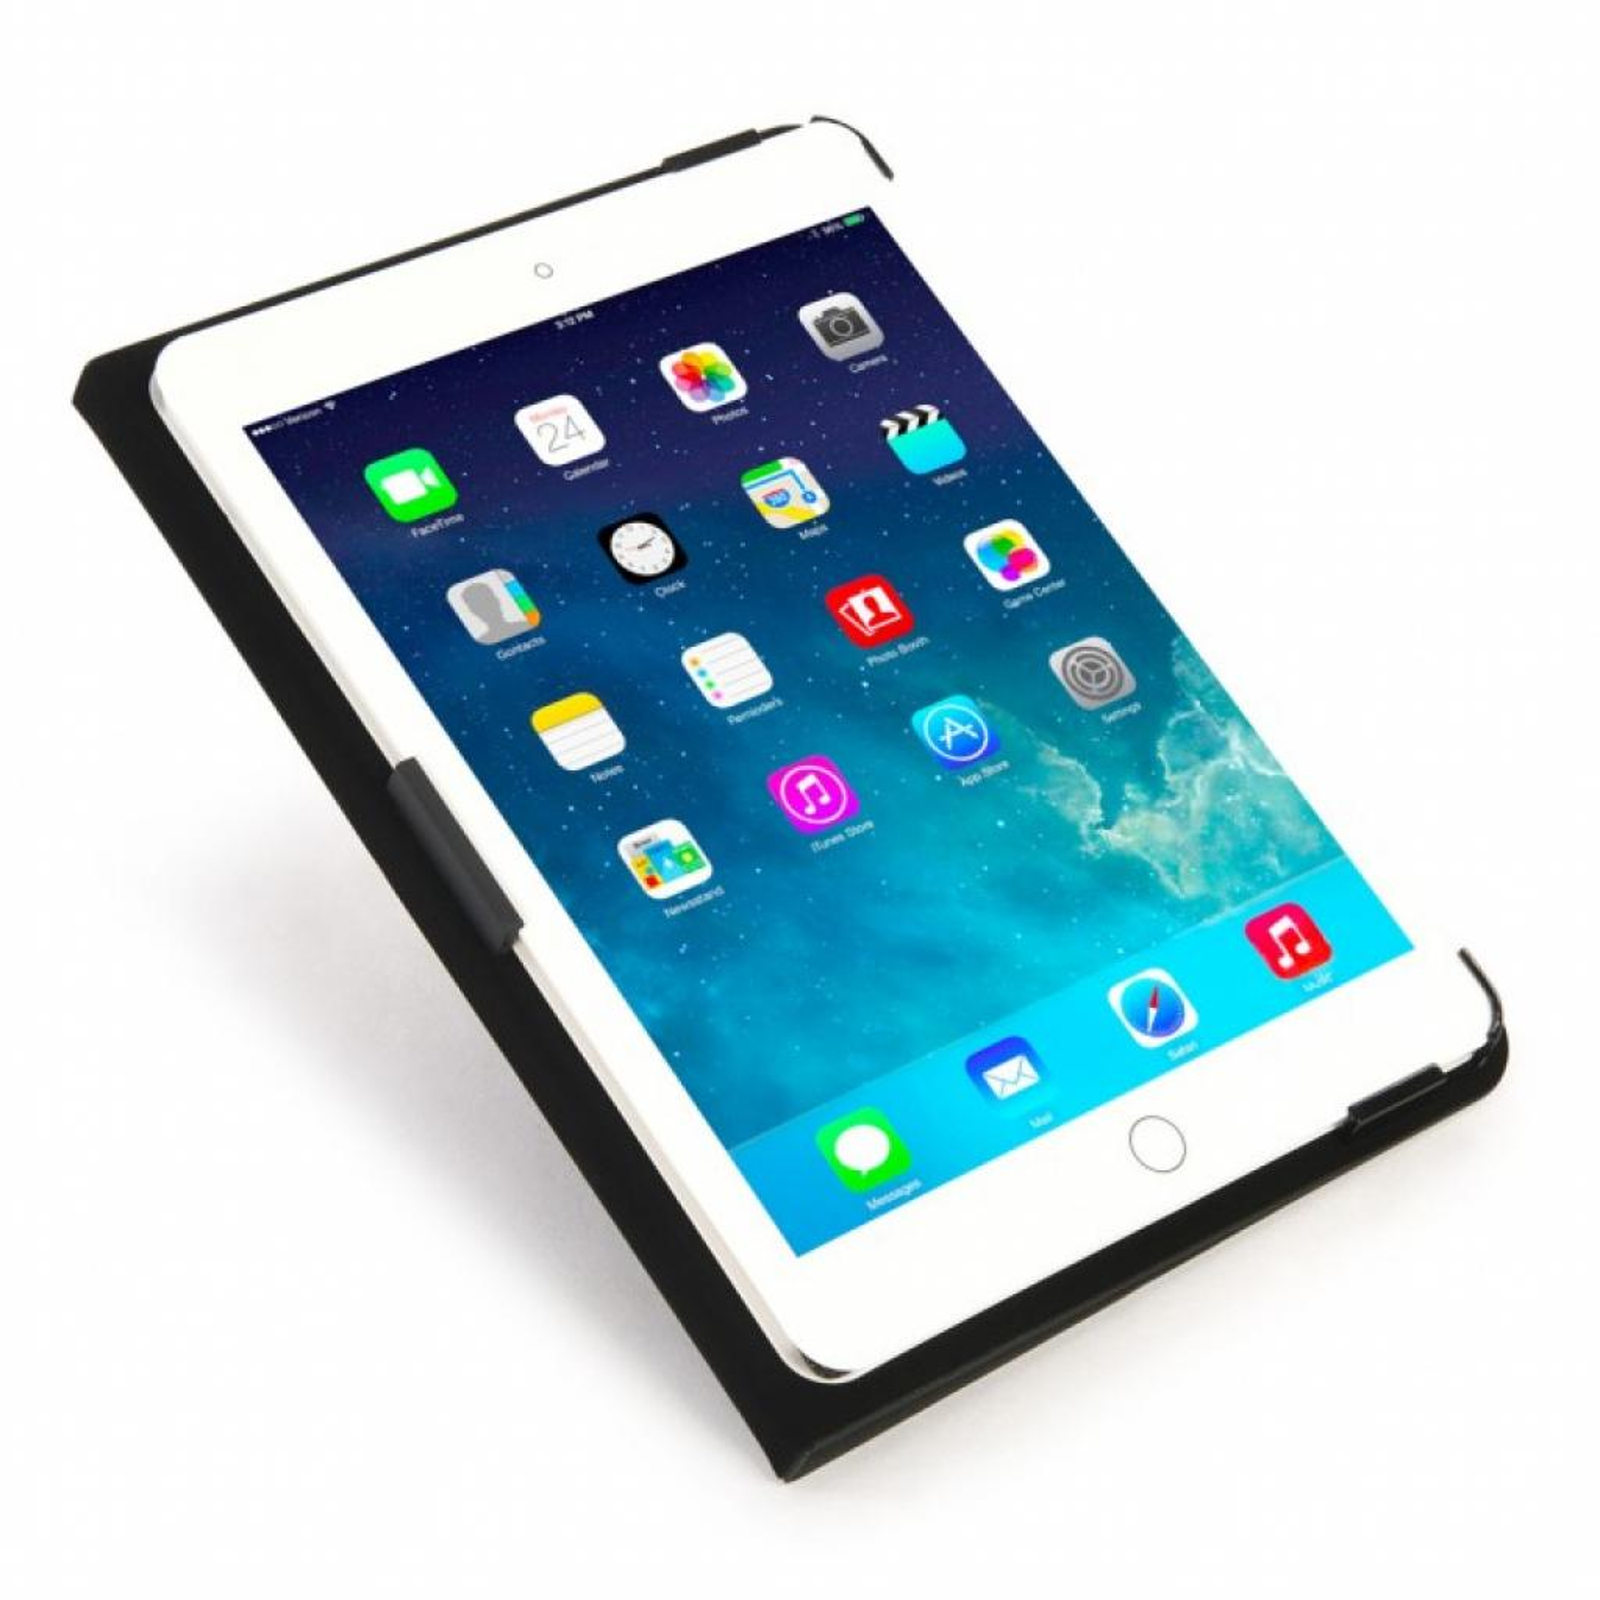 Чехол для планшета Tucano iPad Air Filo Black (IPD5FI) изображение 7